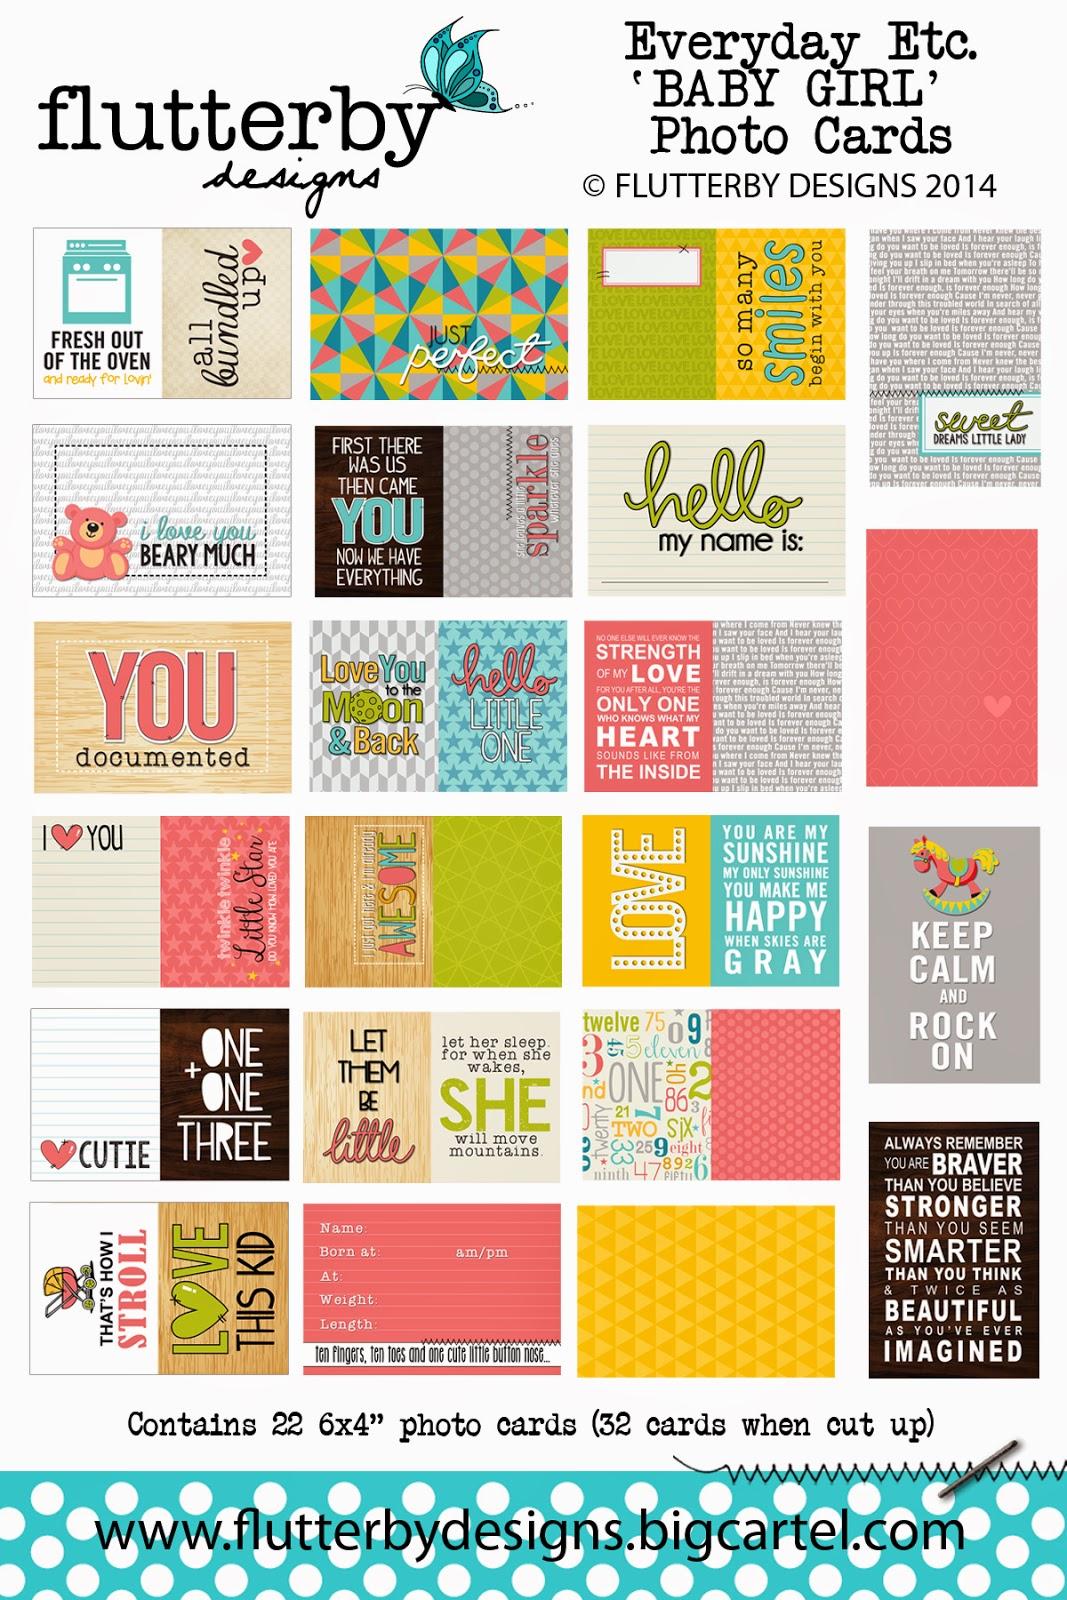 http://flutterbydesigns.bigcartel.com/product/everyday-etc-cards-baby-girl-set